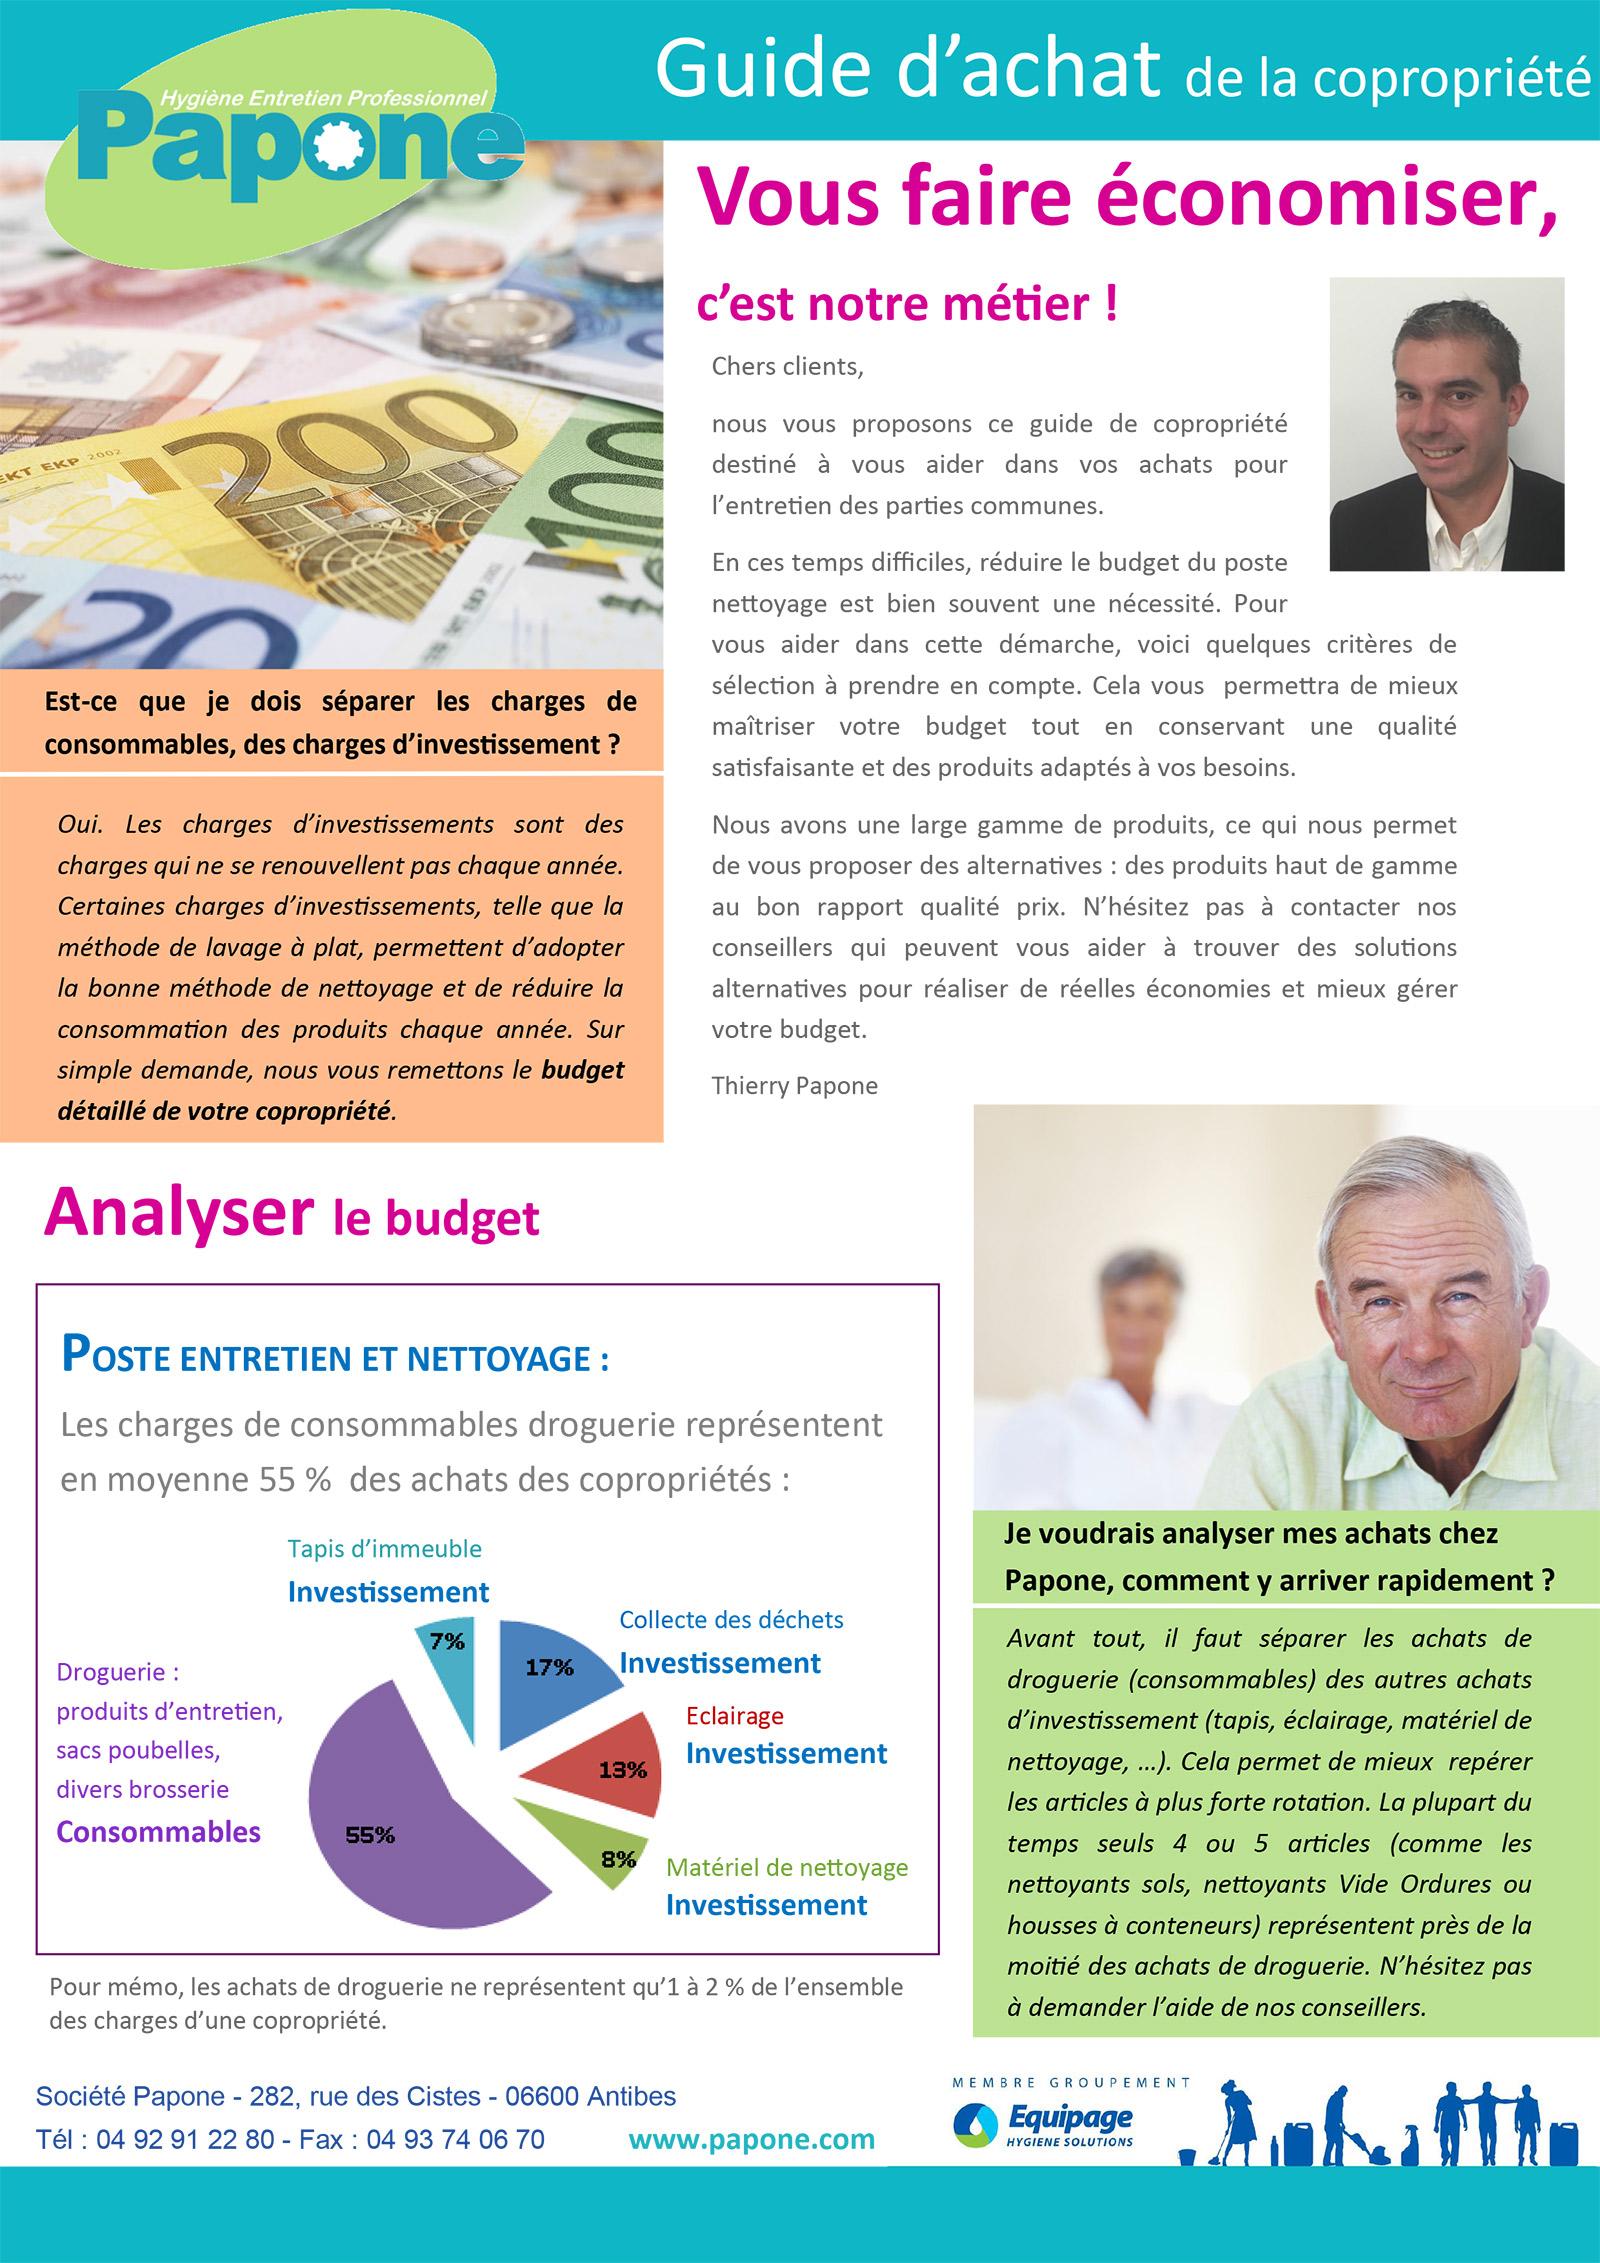 newsletter-guide-achat-copropriete-2016-1